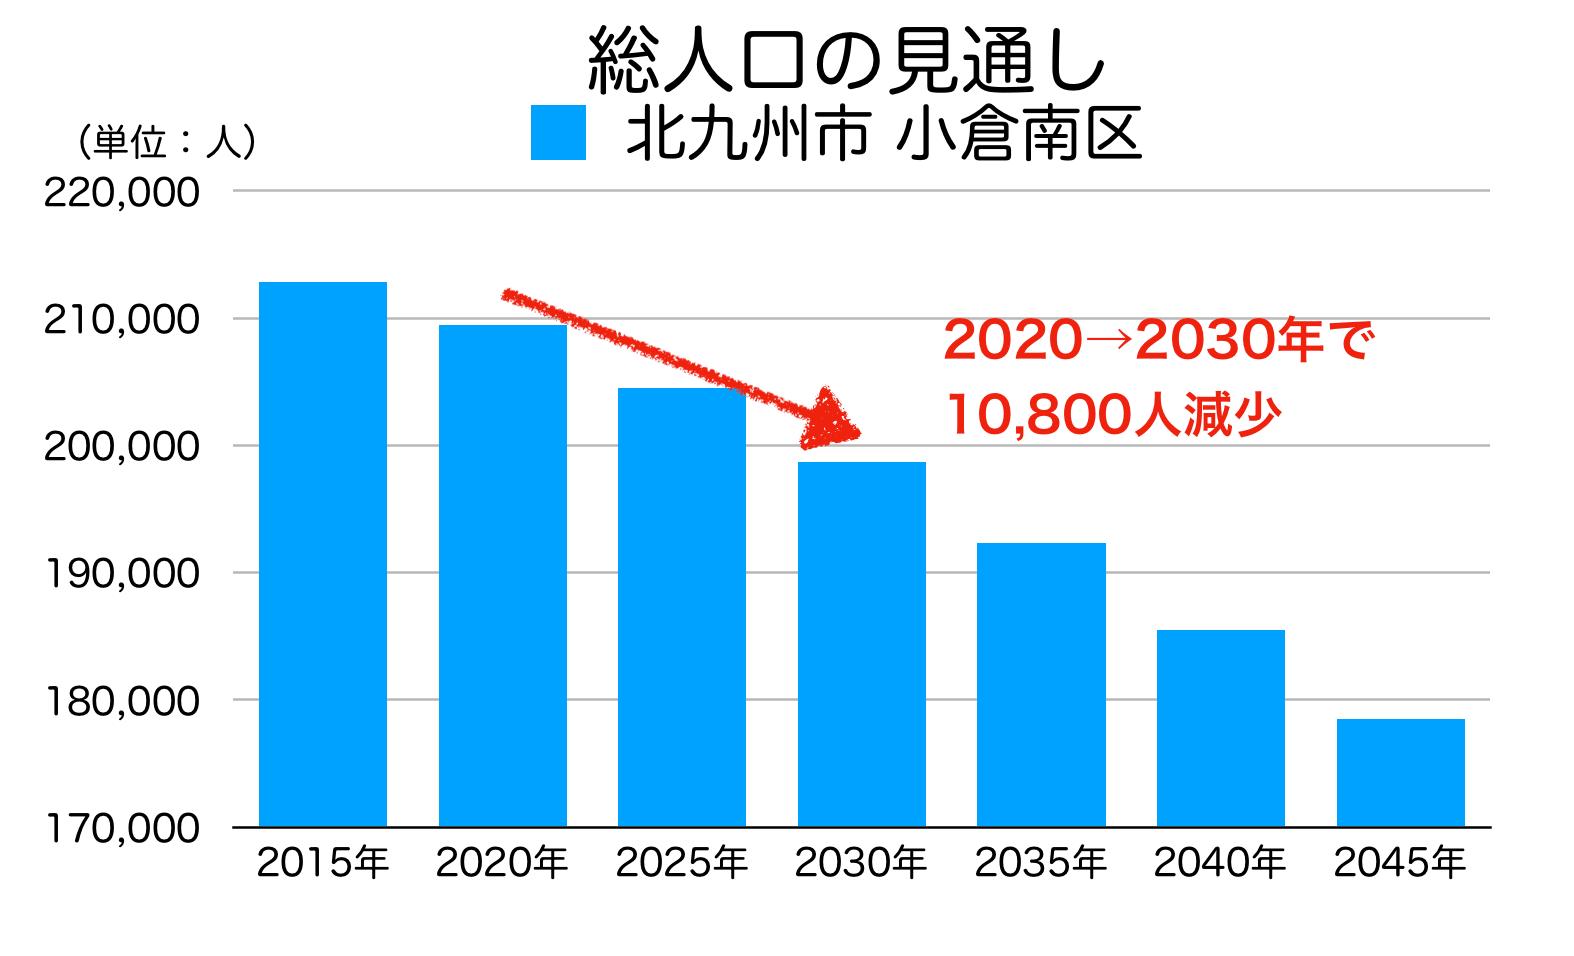 北九州市小倉南区の人口予測